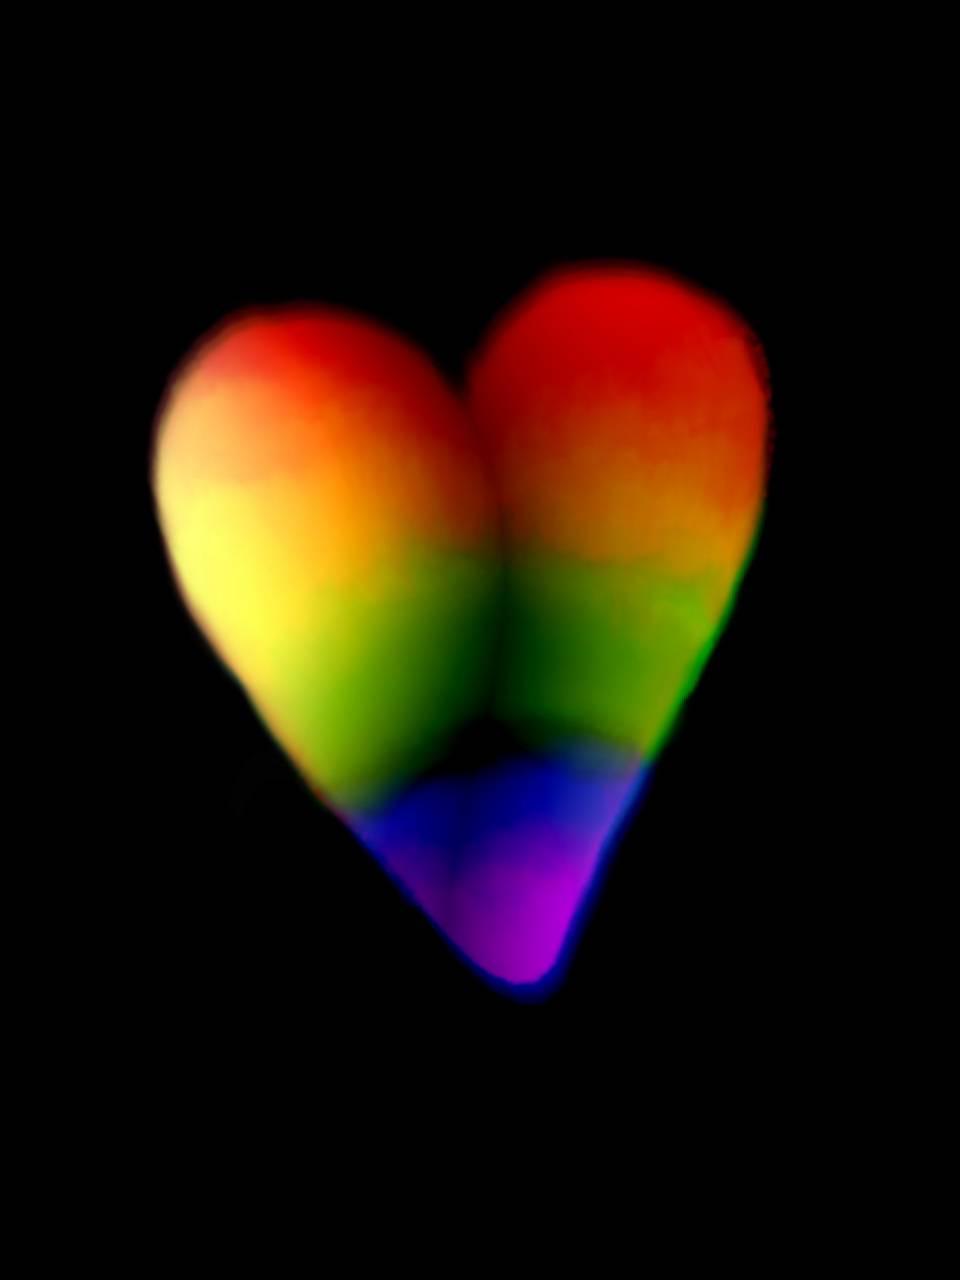 Rainbow heart 2021